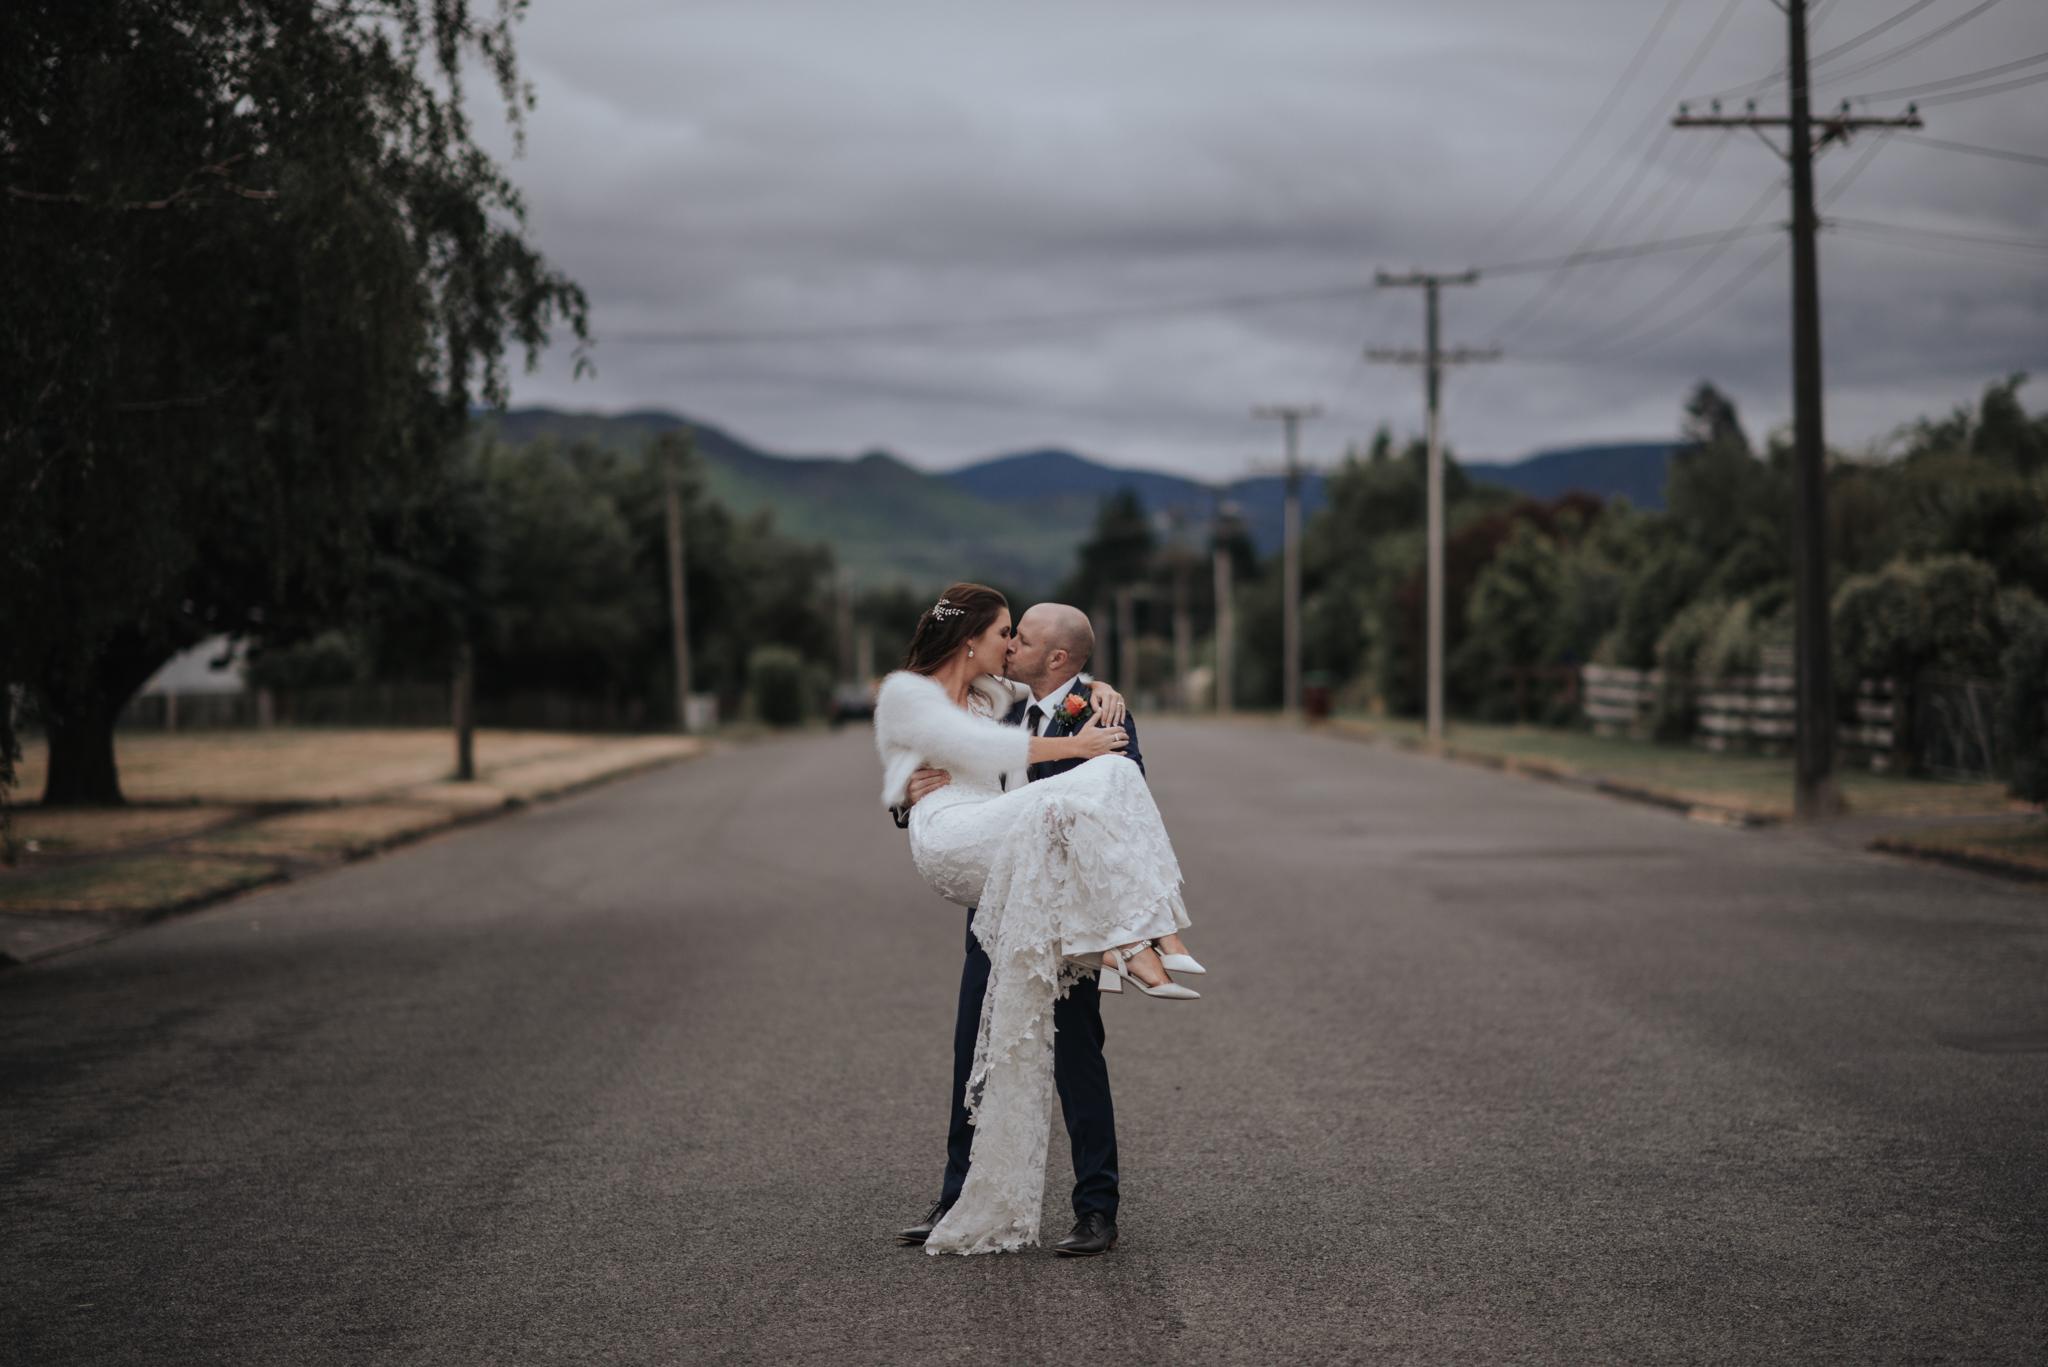 LOVELENSCAPES PHOTOGRAPHY • VISUAL POETRY • NEW ZEALAND WEDDING PHOTOGRAPHER • AUSTRALIAN WEDDING PHOTOGRAPHER • BRISBANE • MELBOURNE • SYDNEY • HOBART • TARUREKA ESTATE • ANNA CAMPBELL • 143.jpg